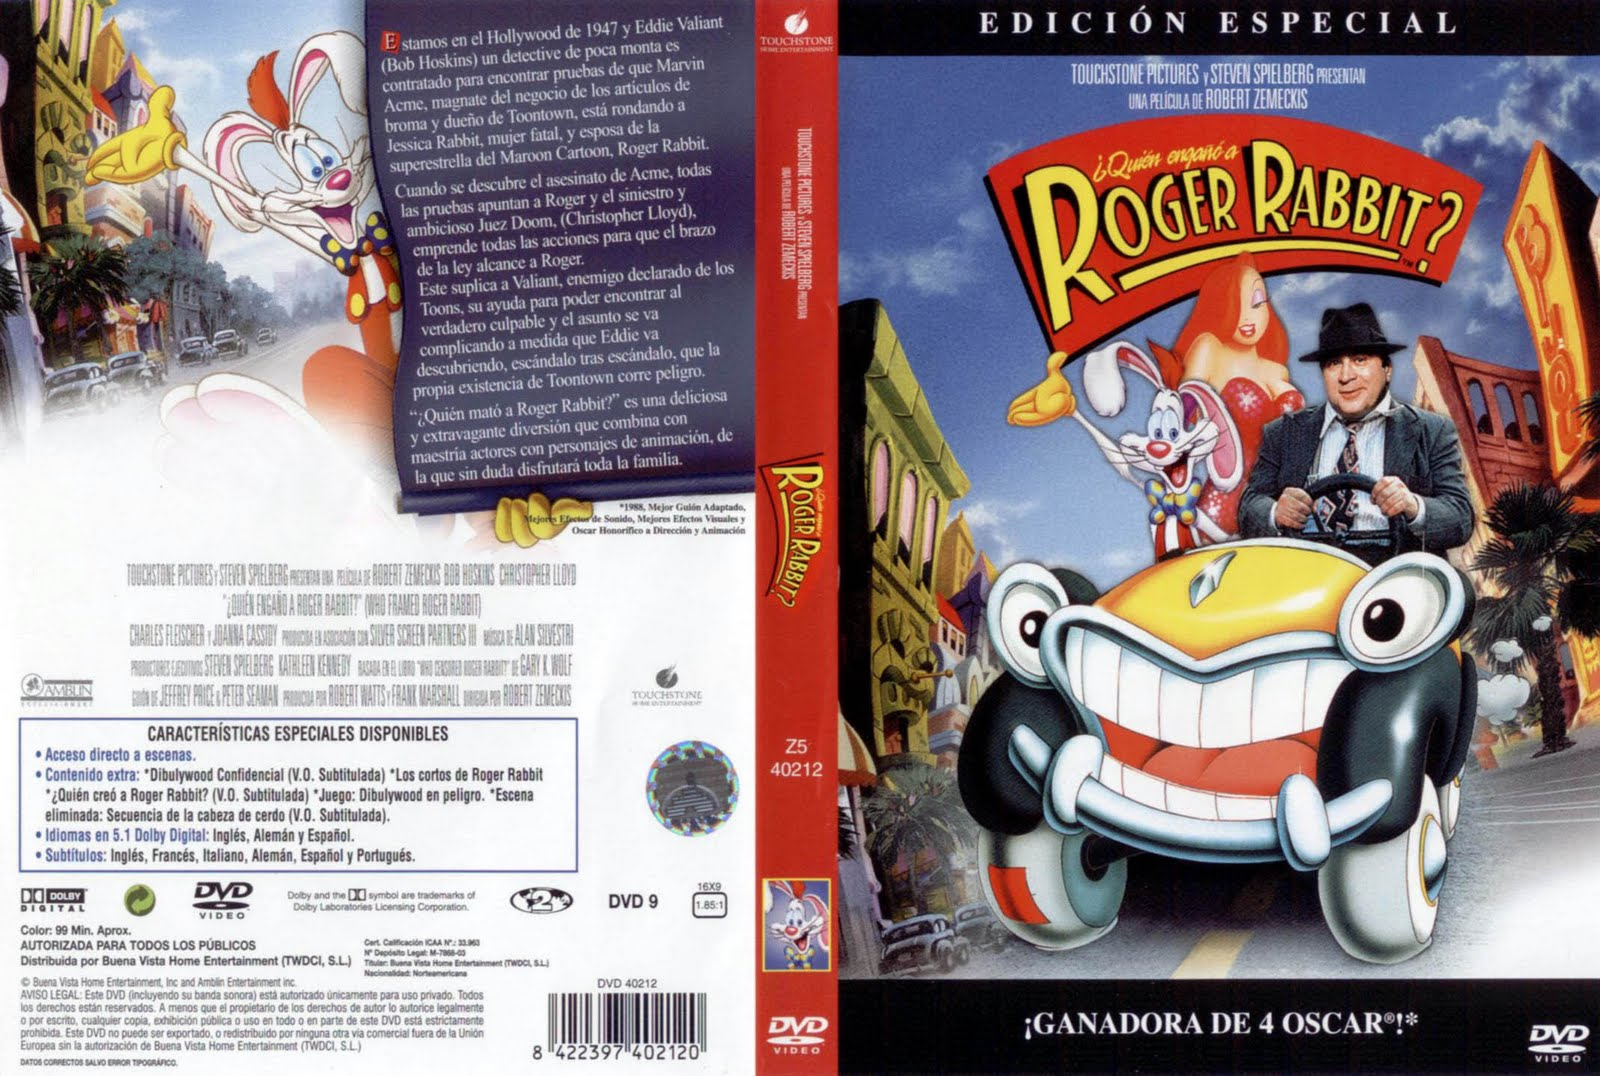 ¿ Quién Engañó a Roger Rabbit ? (1988) DescargaCineClasico.Net